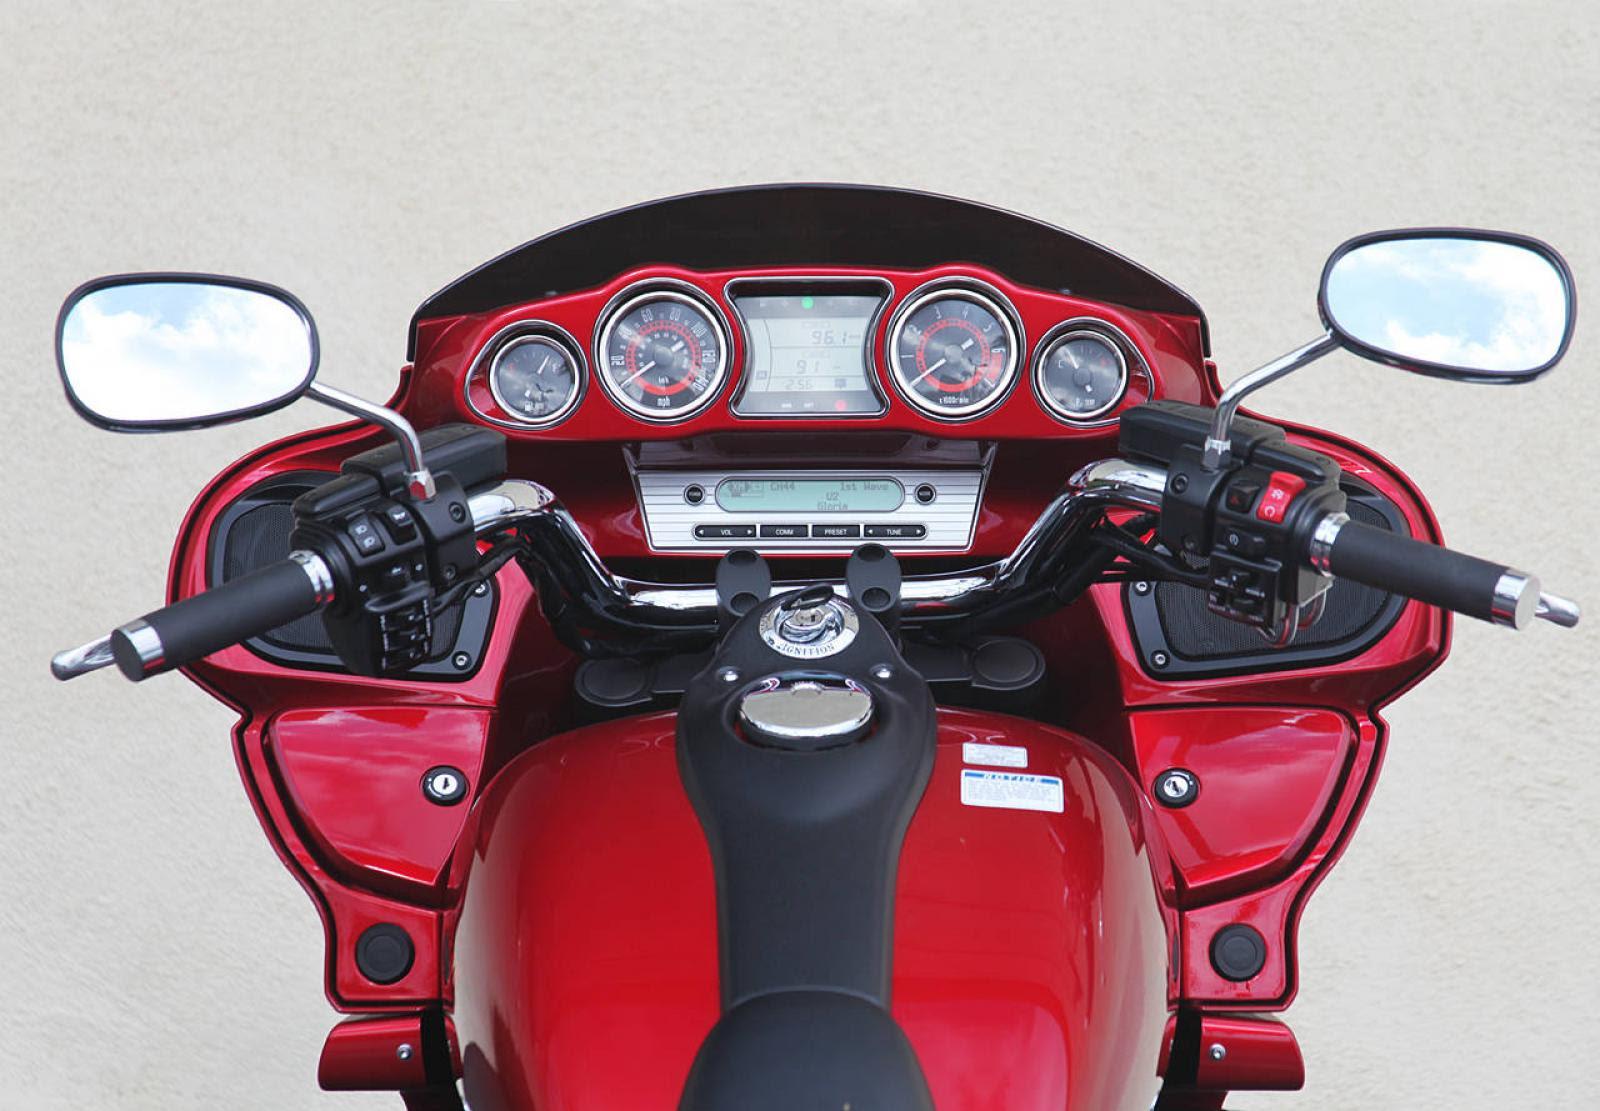 2012 Kawasaki Vulcan 1700 Vaquero Moto Zombdrive Com